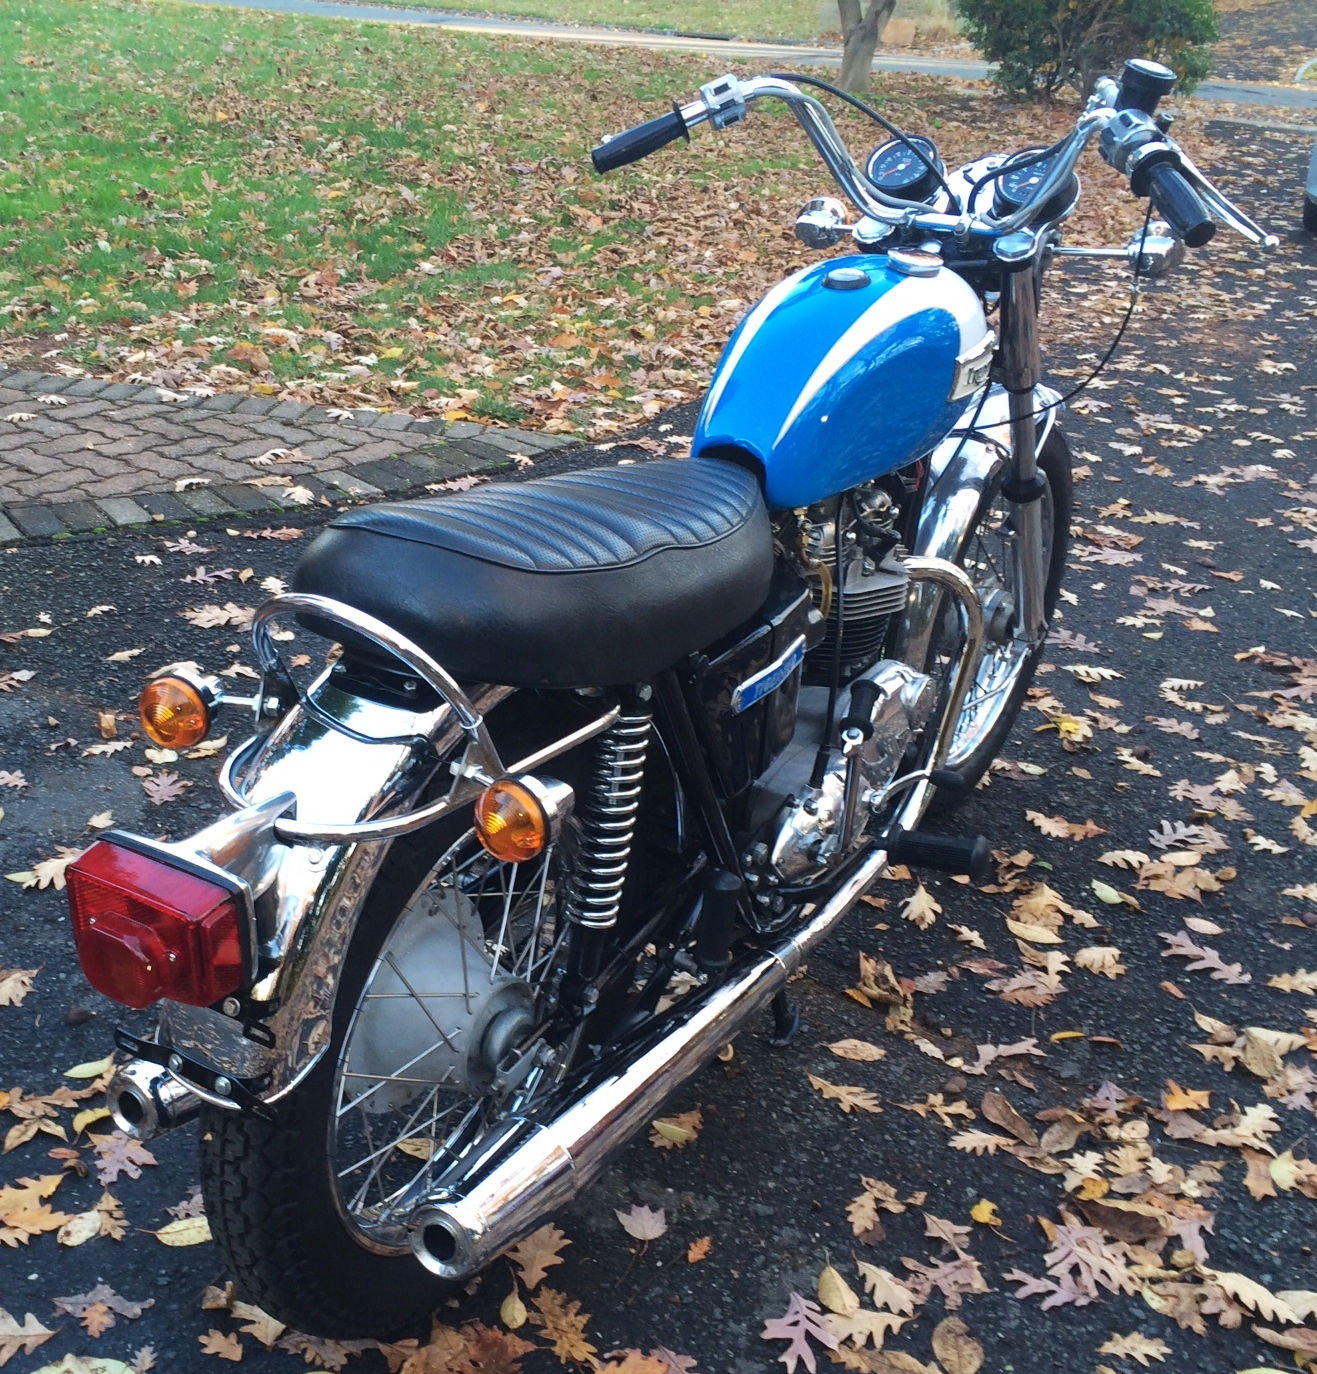 1978 Honda Cx500 Engine For Sale: 1973 Photographs At Classic Bikes